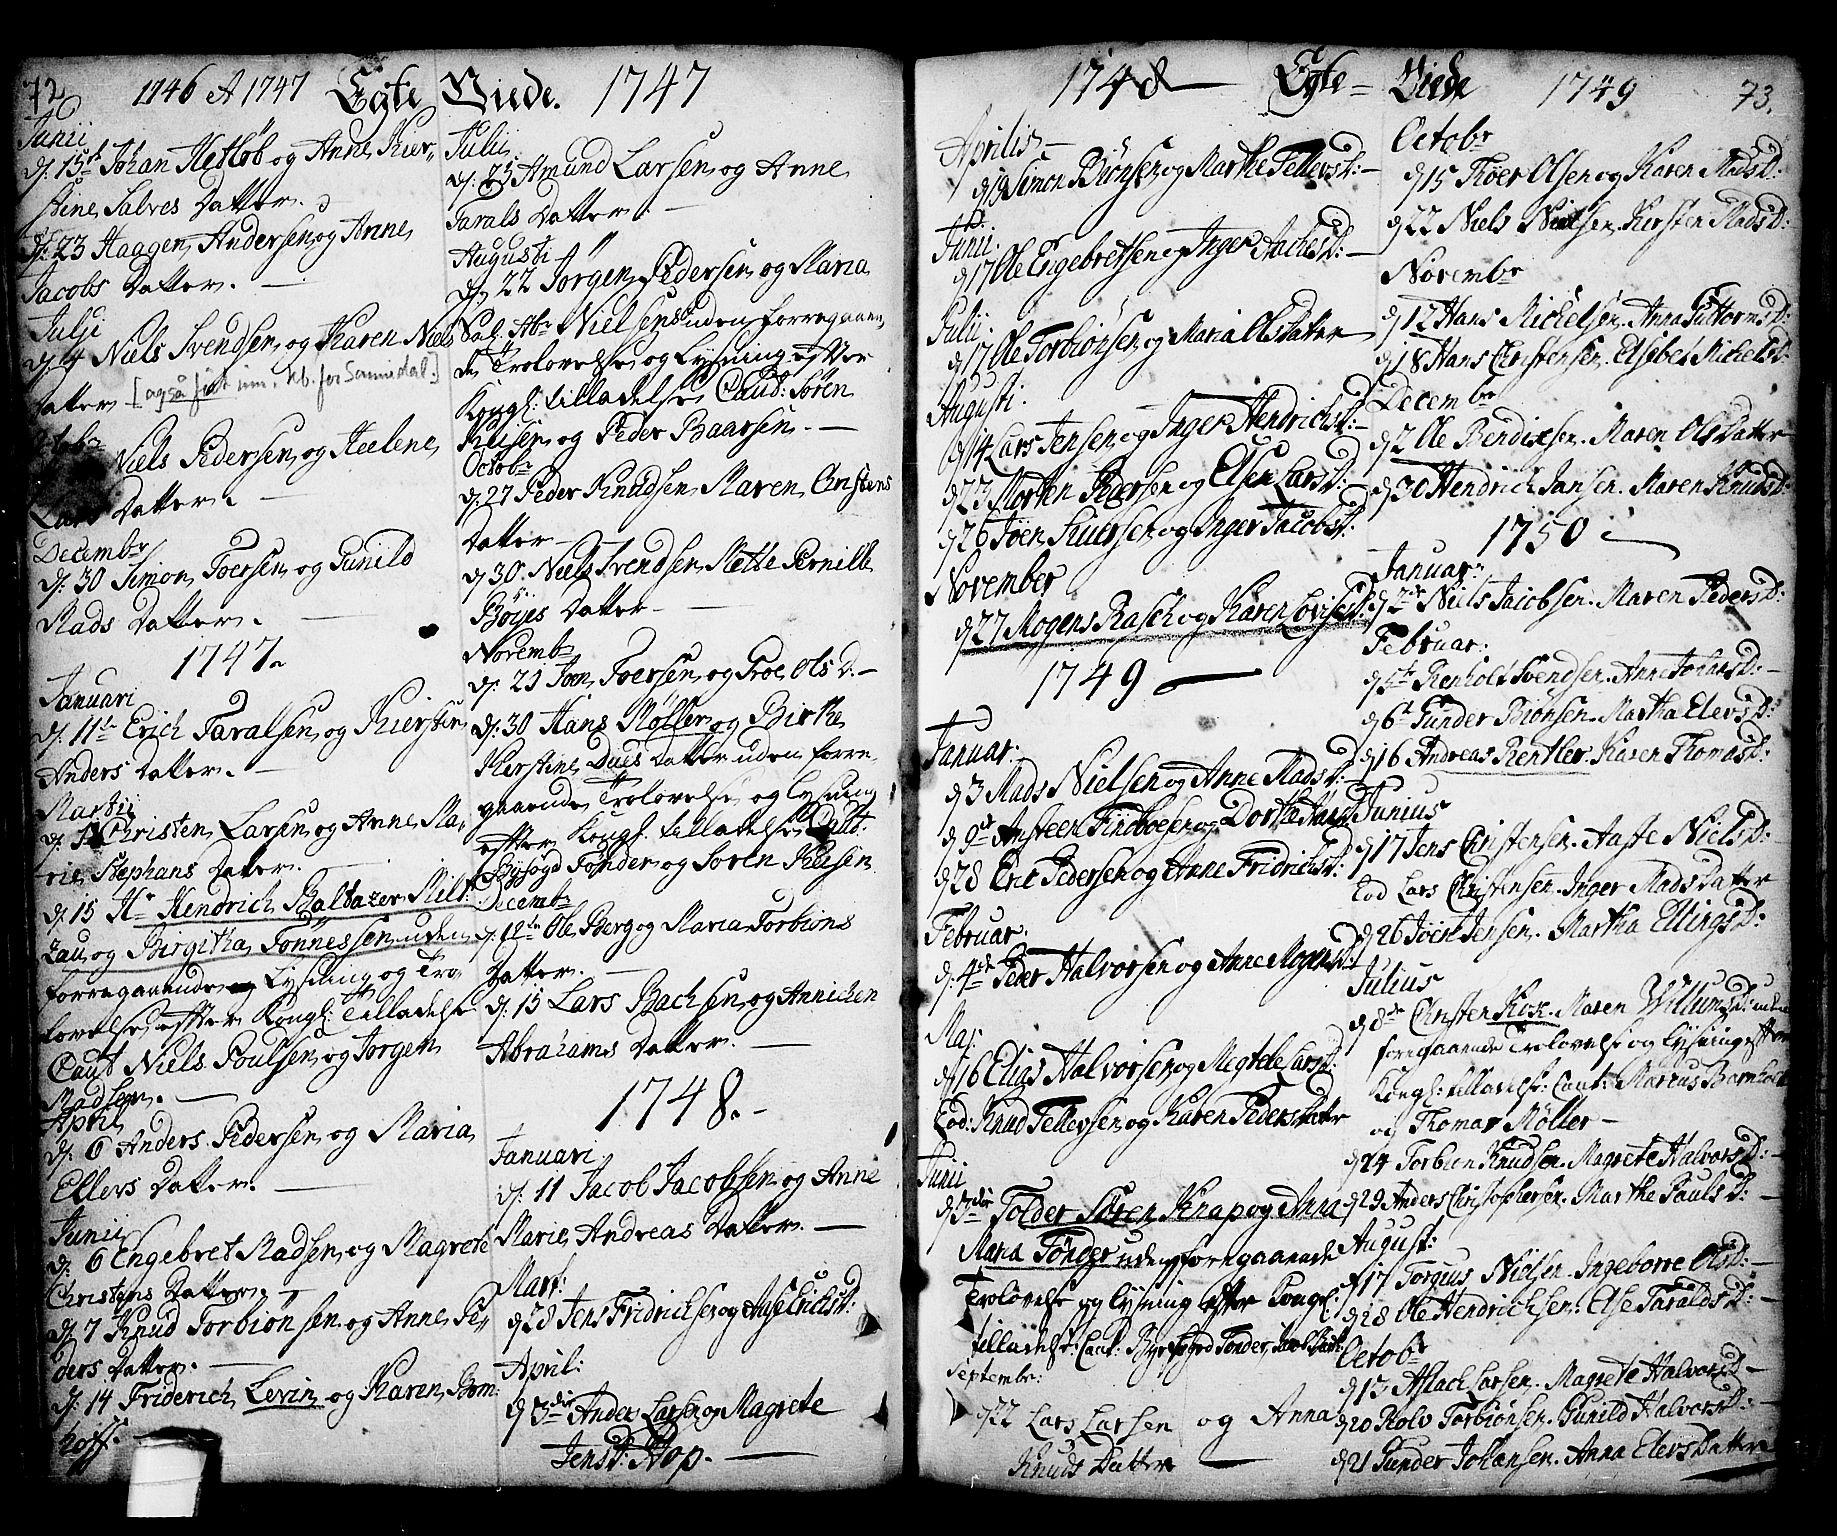 SAKO, Kragerø kirkebøker, F/Fa/L0001: Ministerialbok nr. 1, 1702-1766, s. 72-73